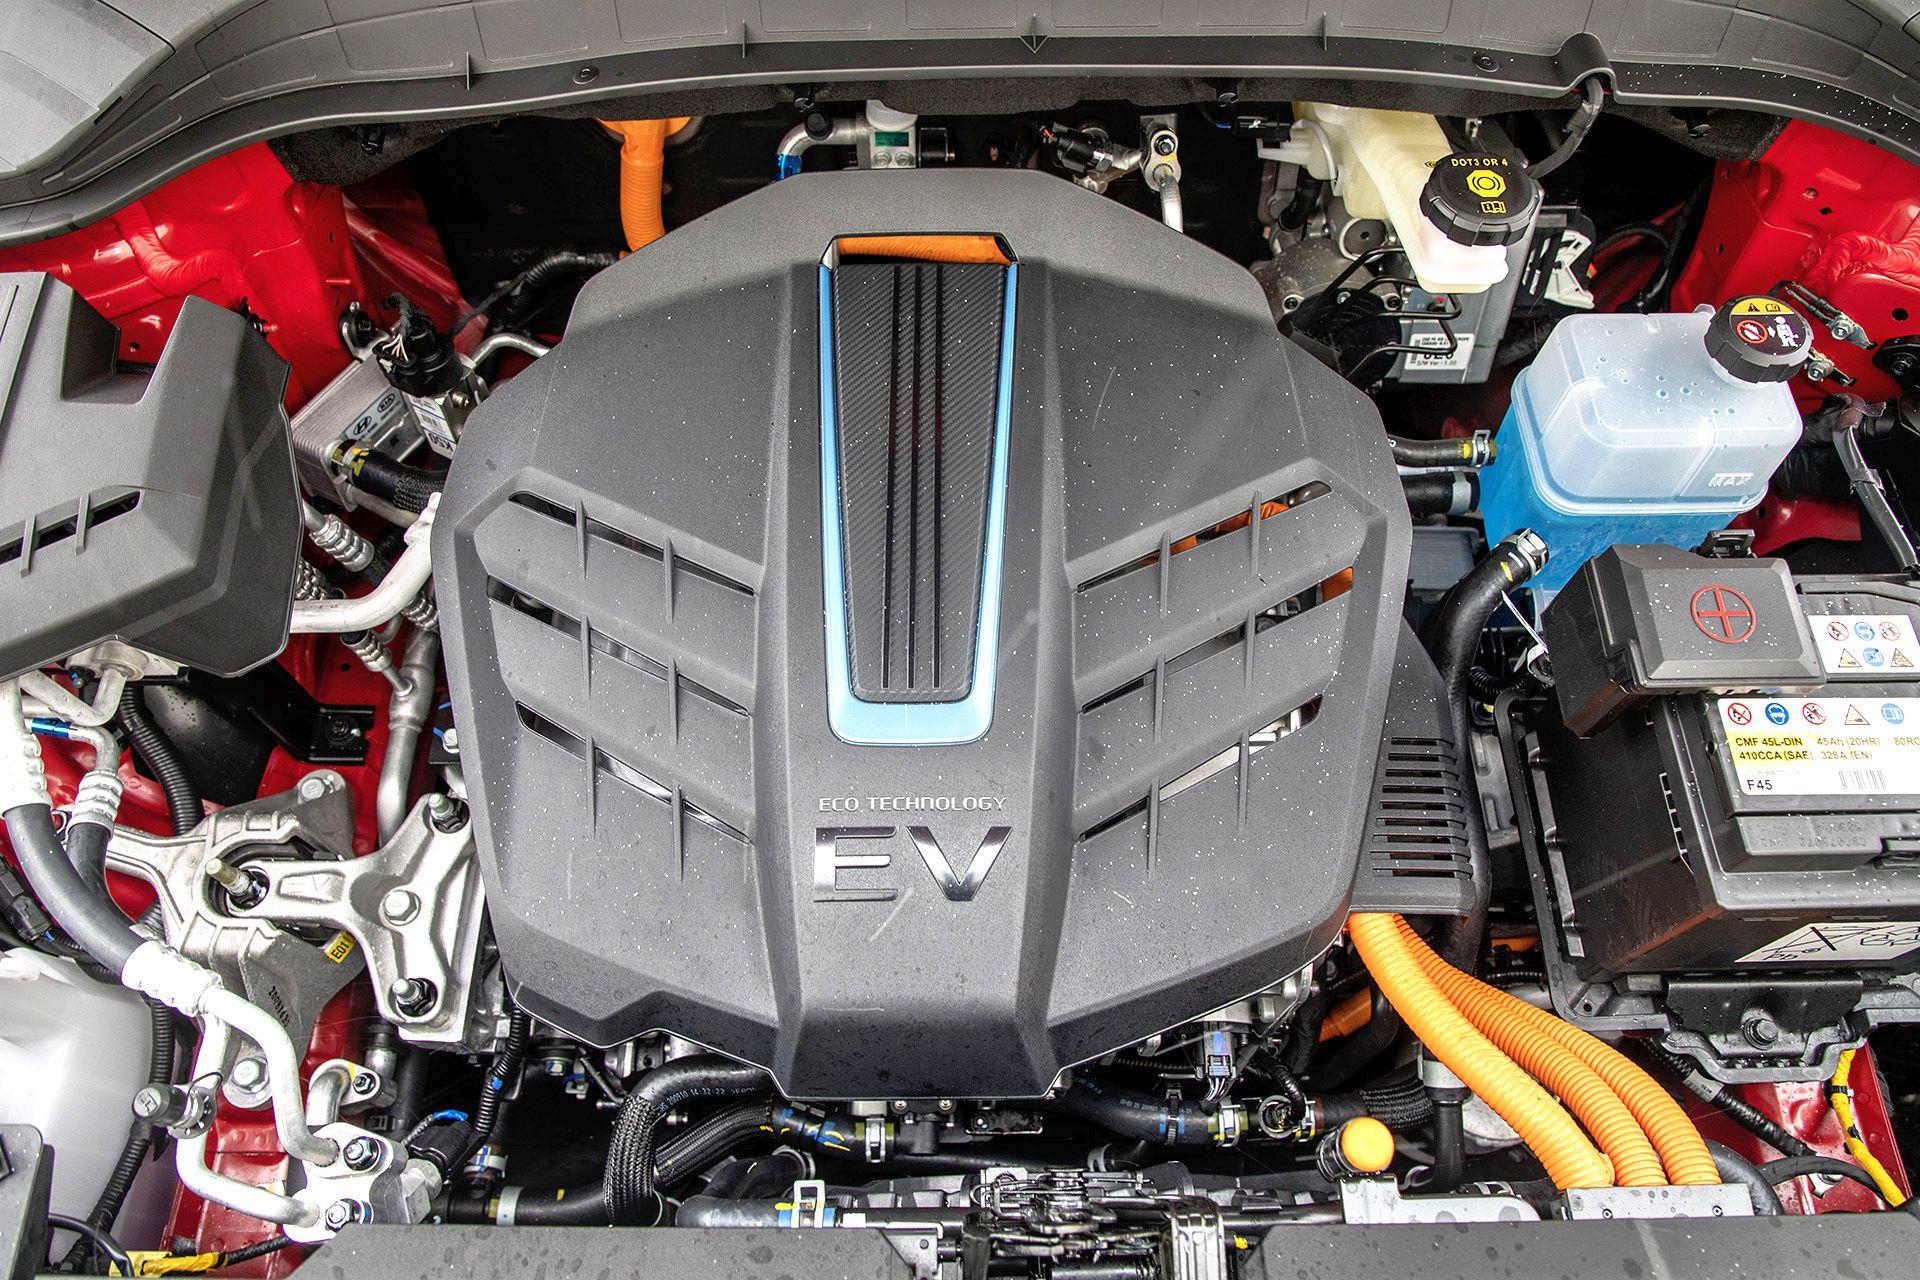 2021 Hyundai Kona electric 64 kWh (1)